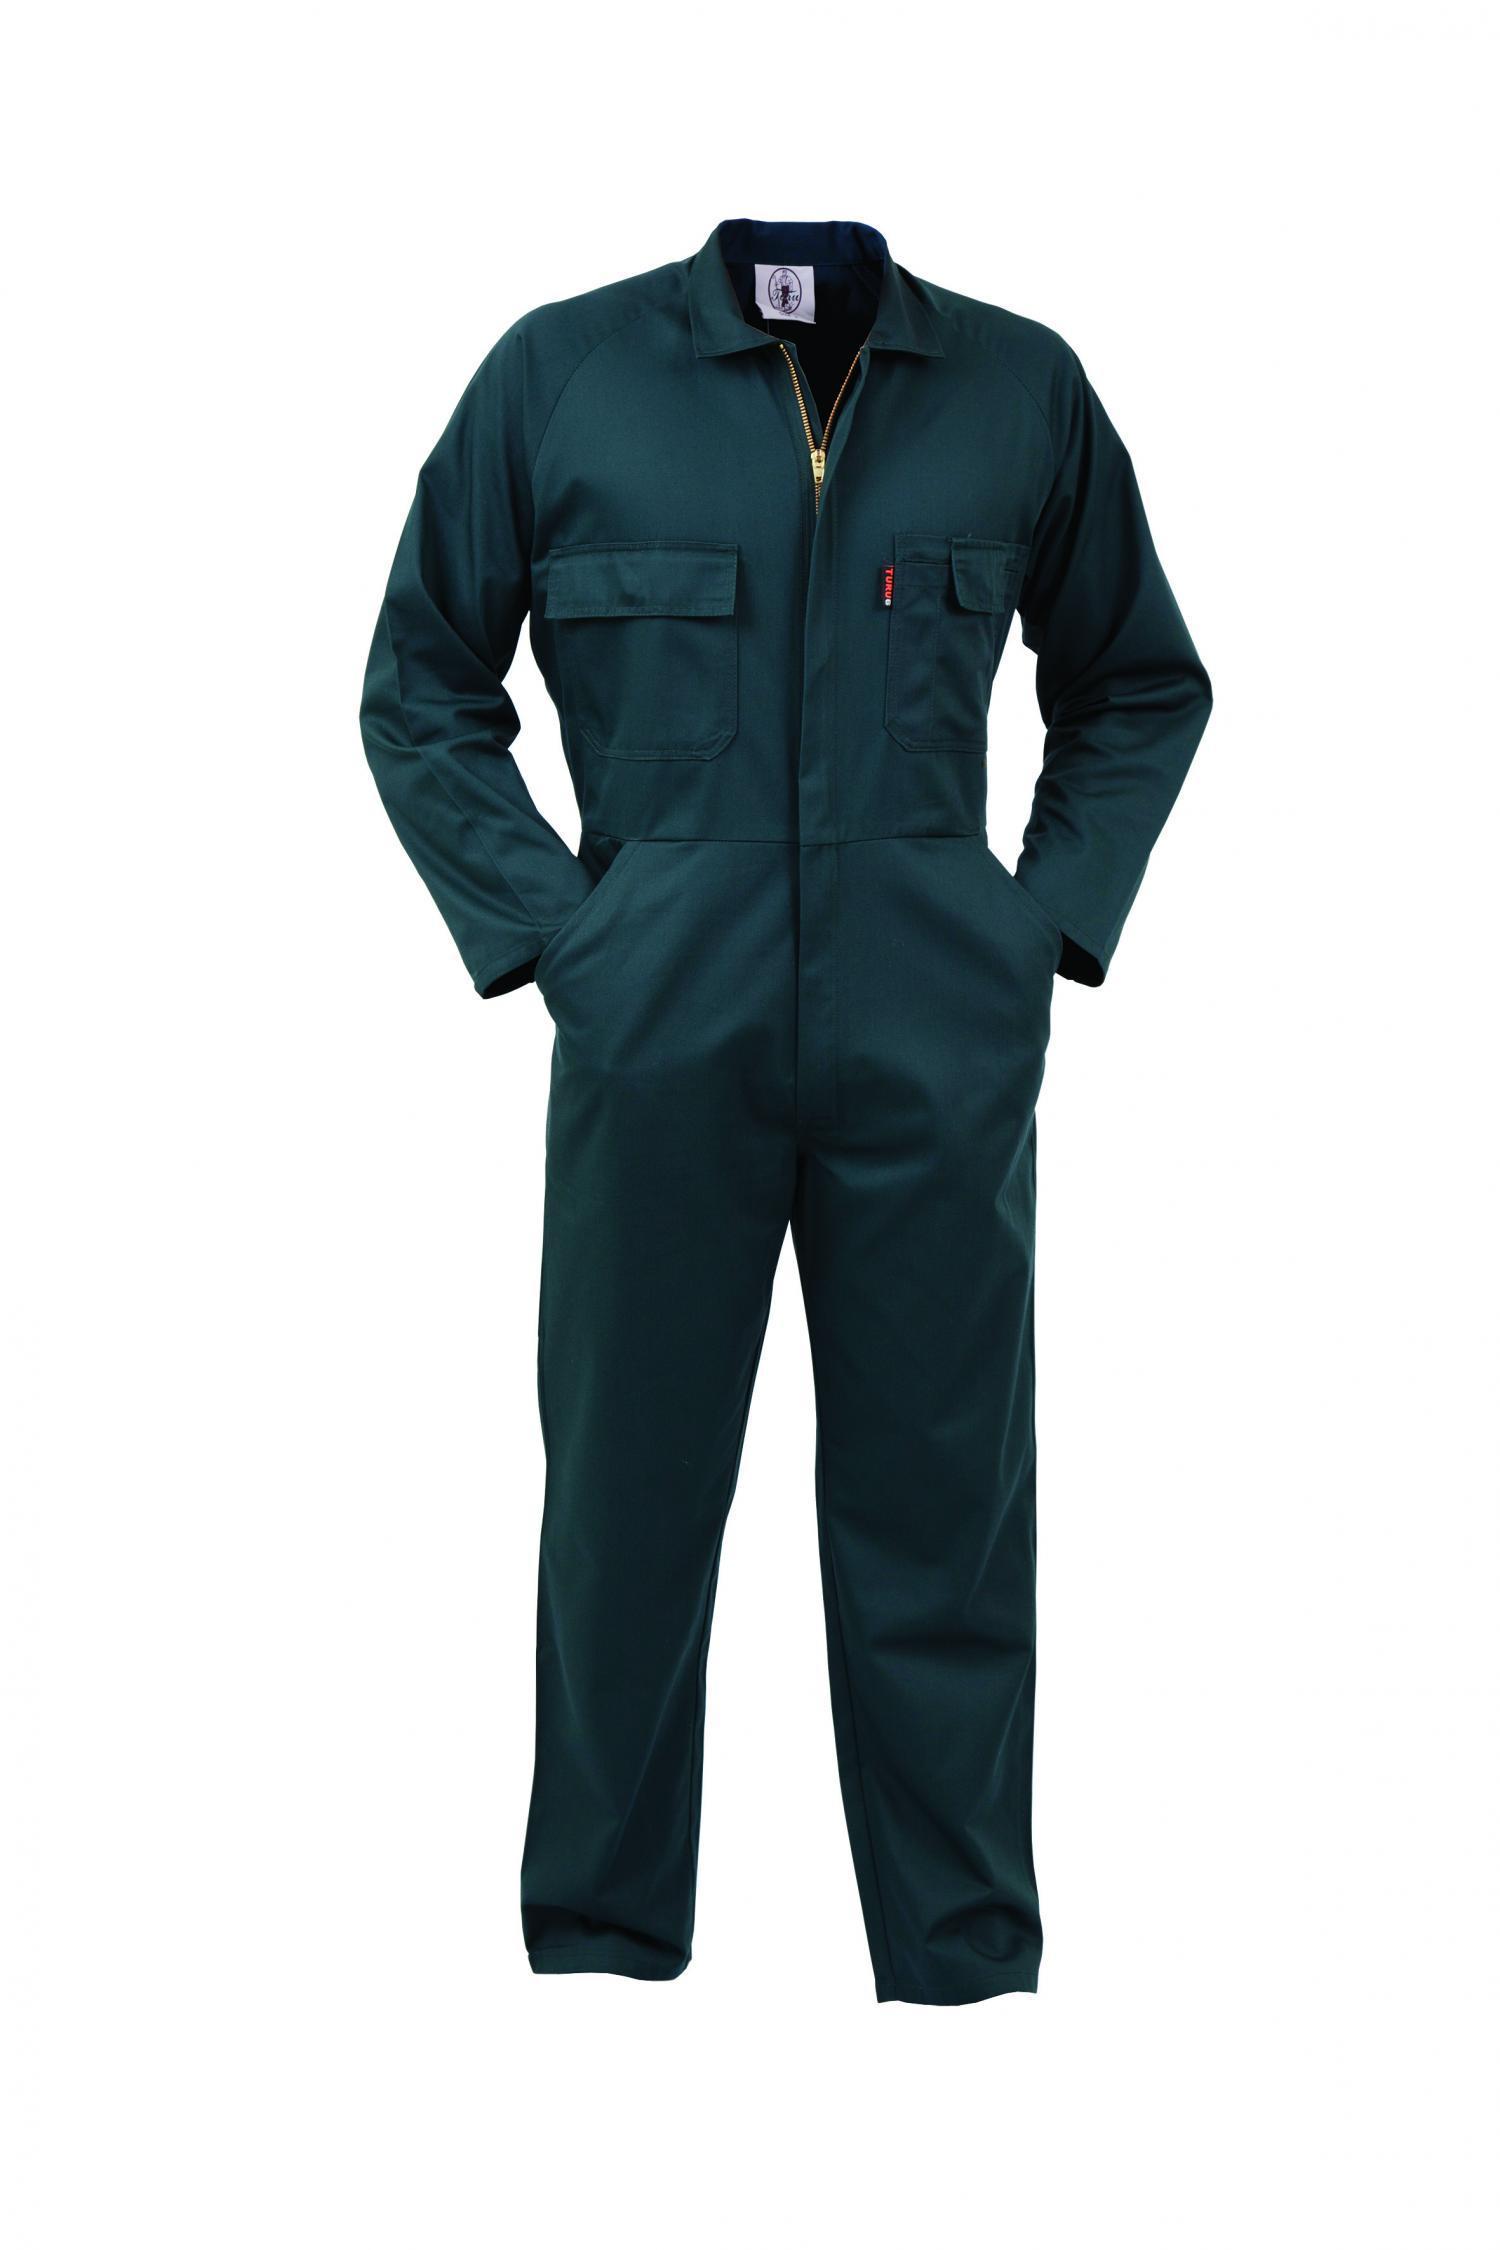 Premium Zip Front Overall Workwear Workwear The